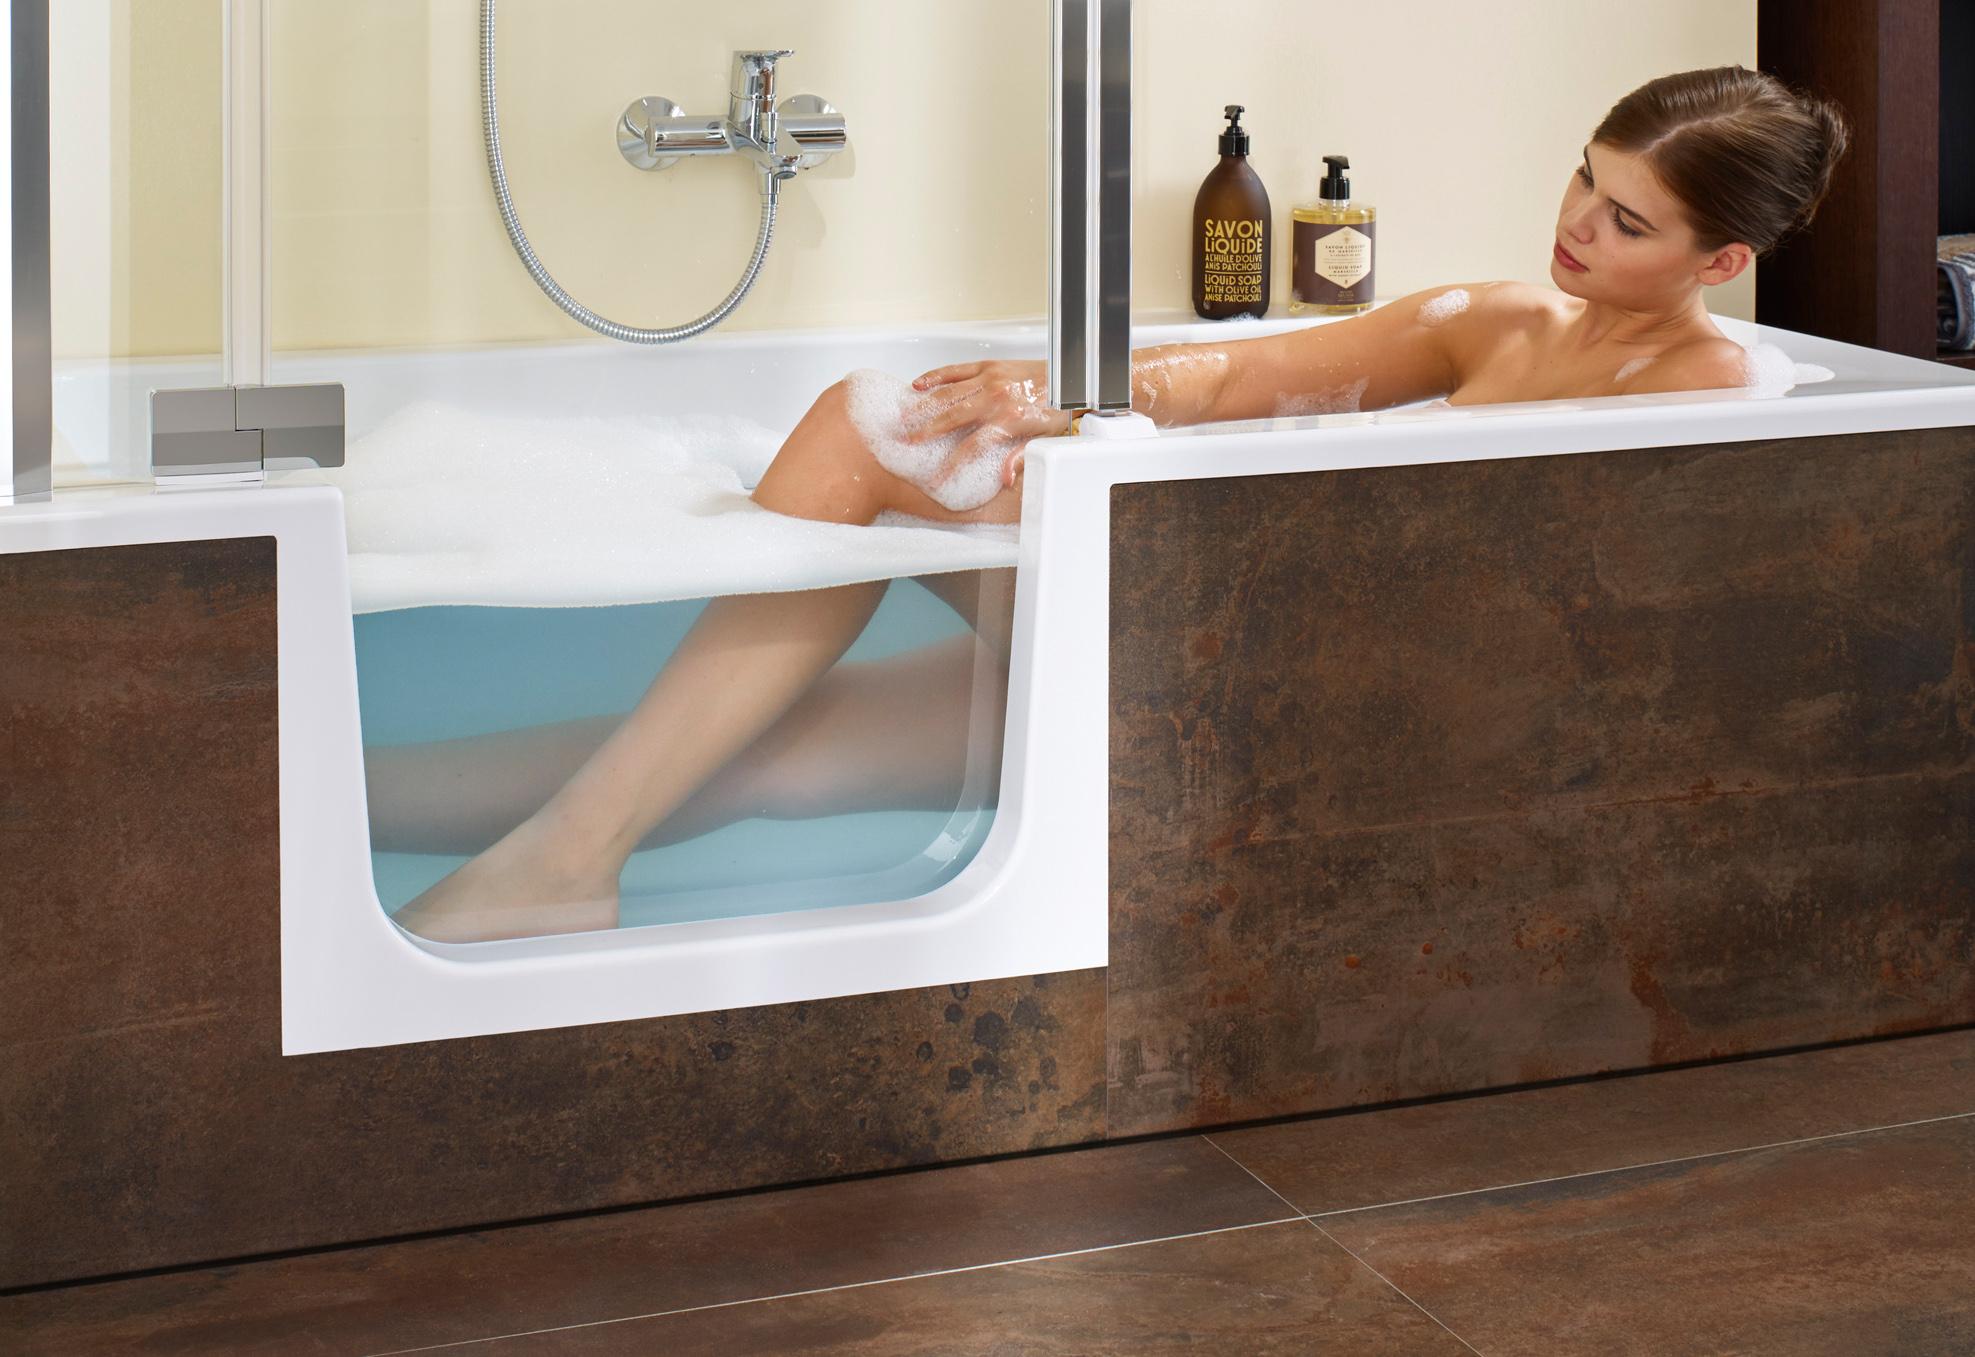 shower, bathtub and easy access - duett